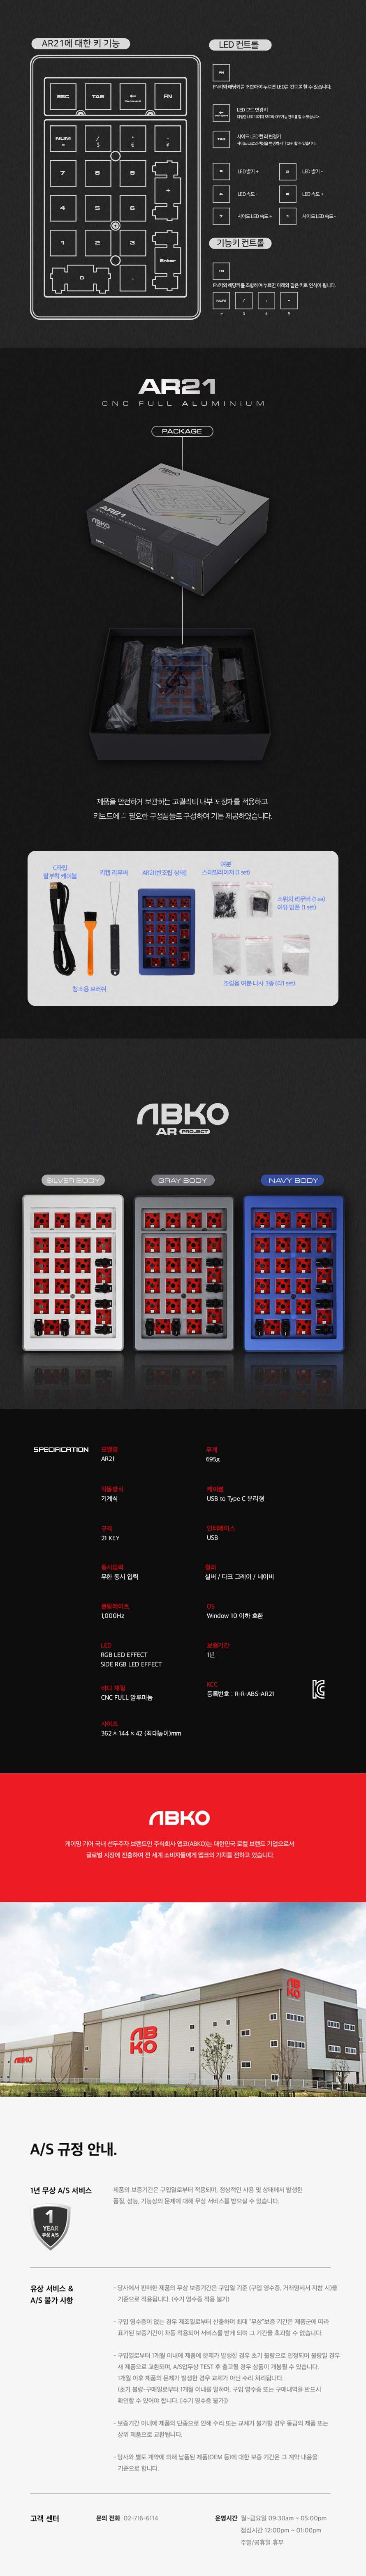 ABKO  AR21 CNC 풀 알루미늄 DIY KIT 넘버패드(네이비)